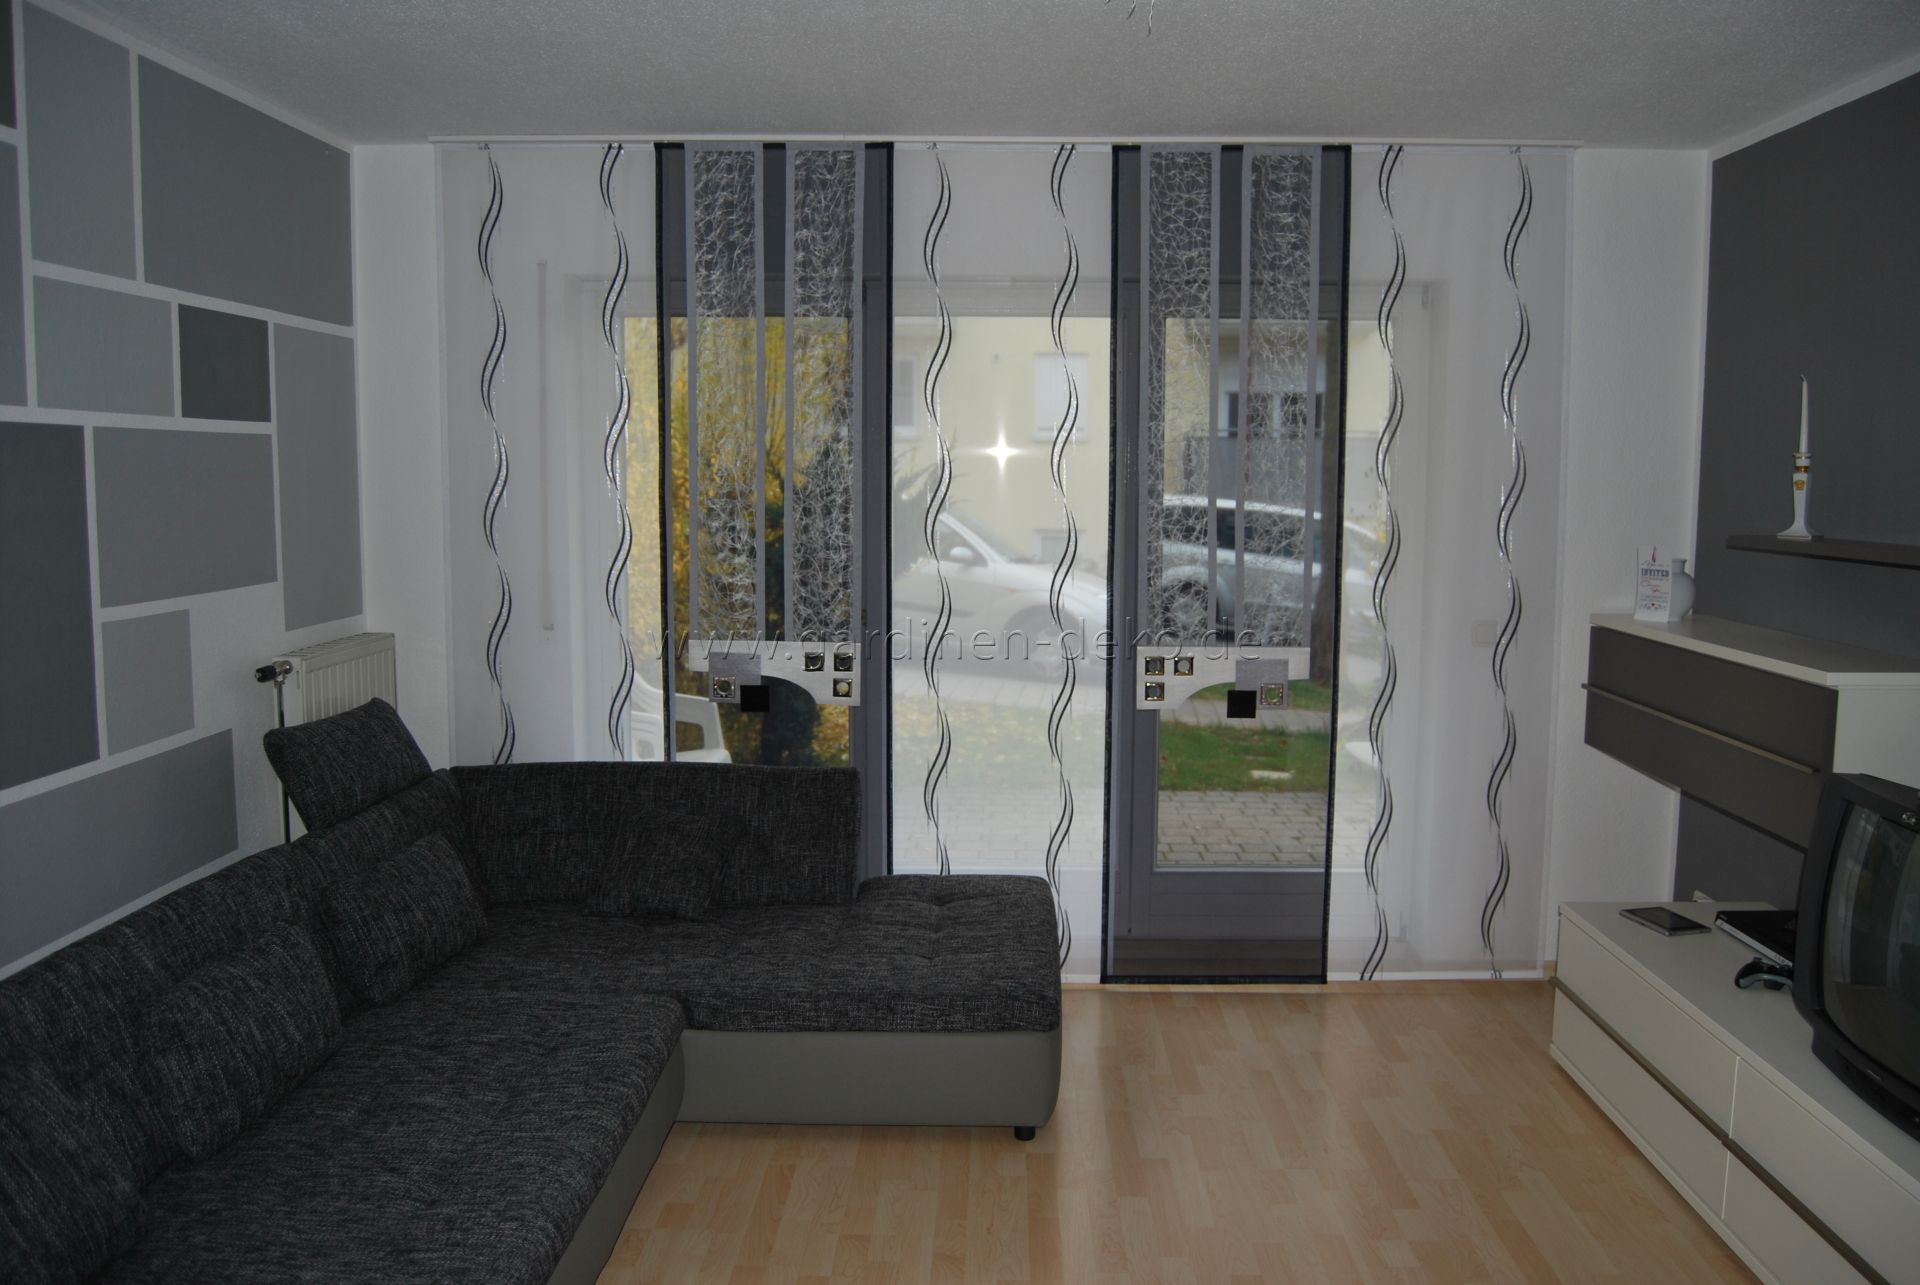 schiebevorh nge f r wohnzimmer stroyreestr. Black Bedroom Furniture Sets. Home Design Ideas